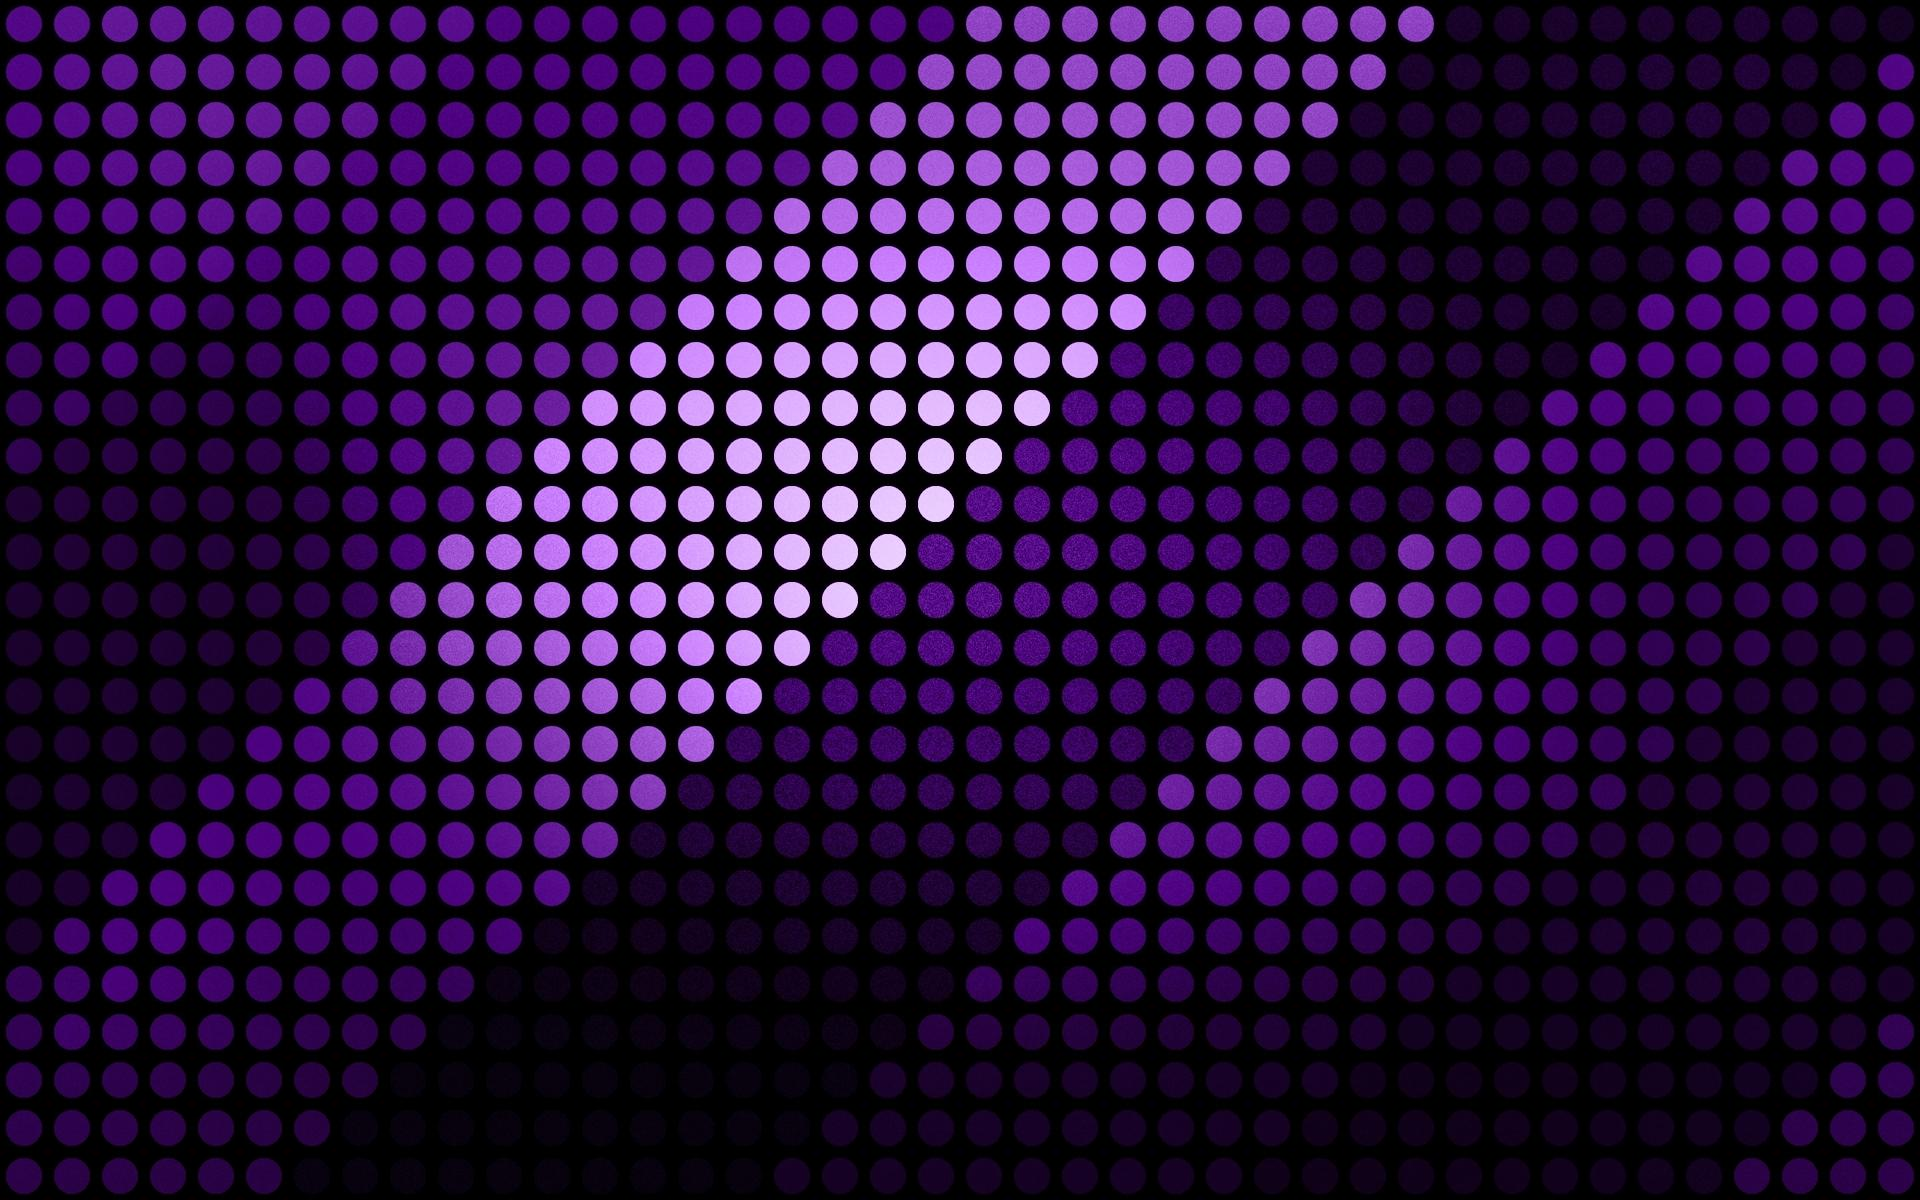 Purple Black Wallpaper